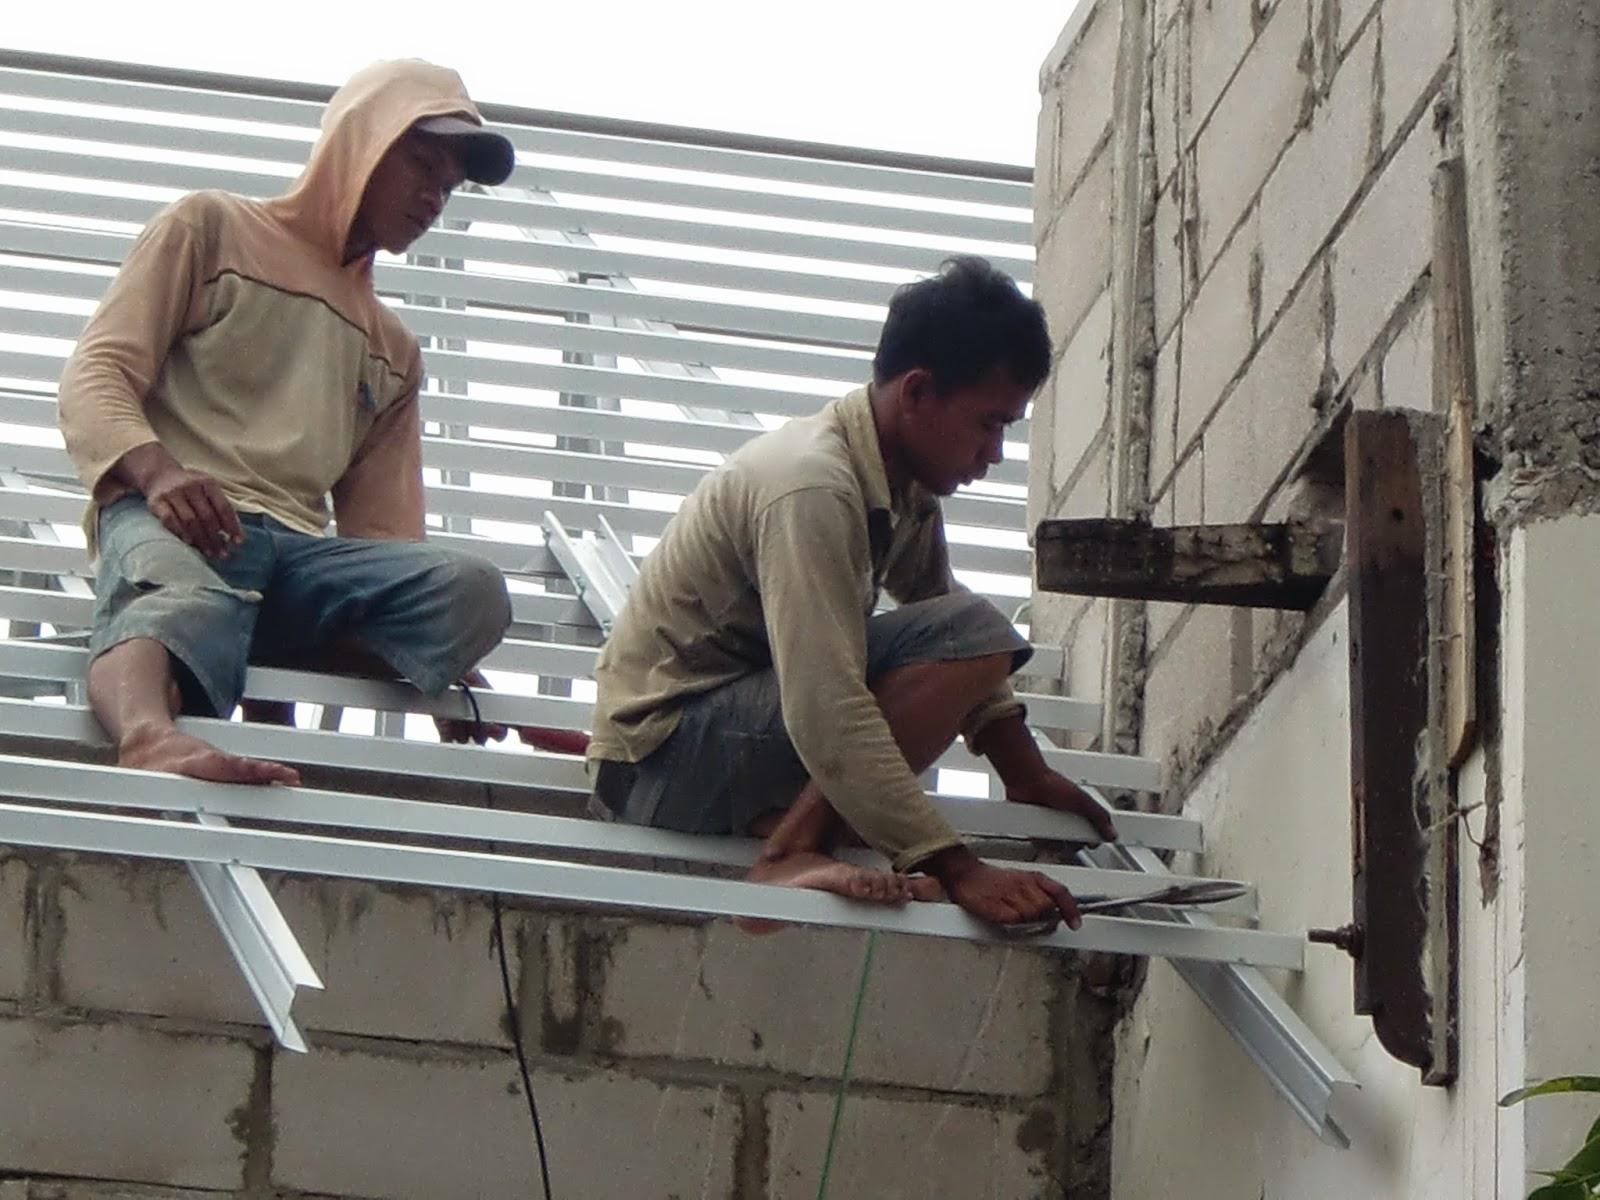 Pengerjaan Baja Ringan di Bumi Sarinah Pancoran Jakarta Selatan